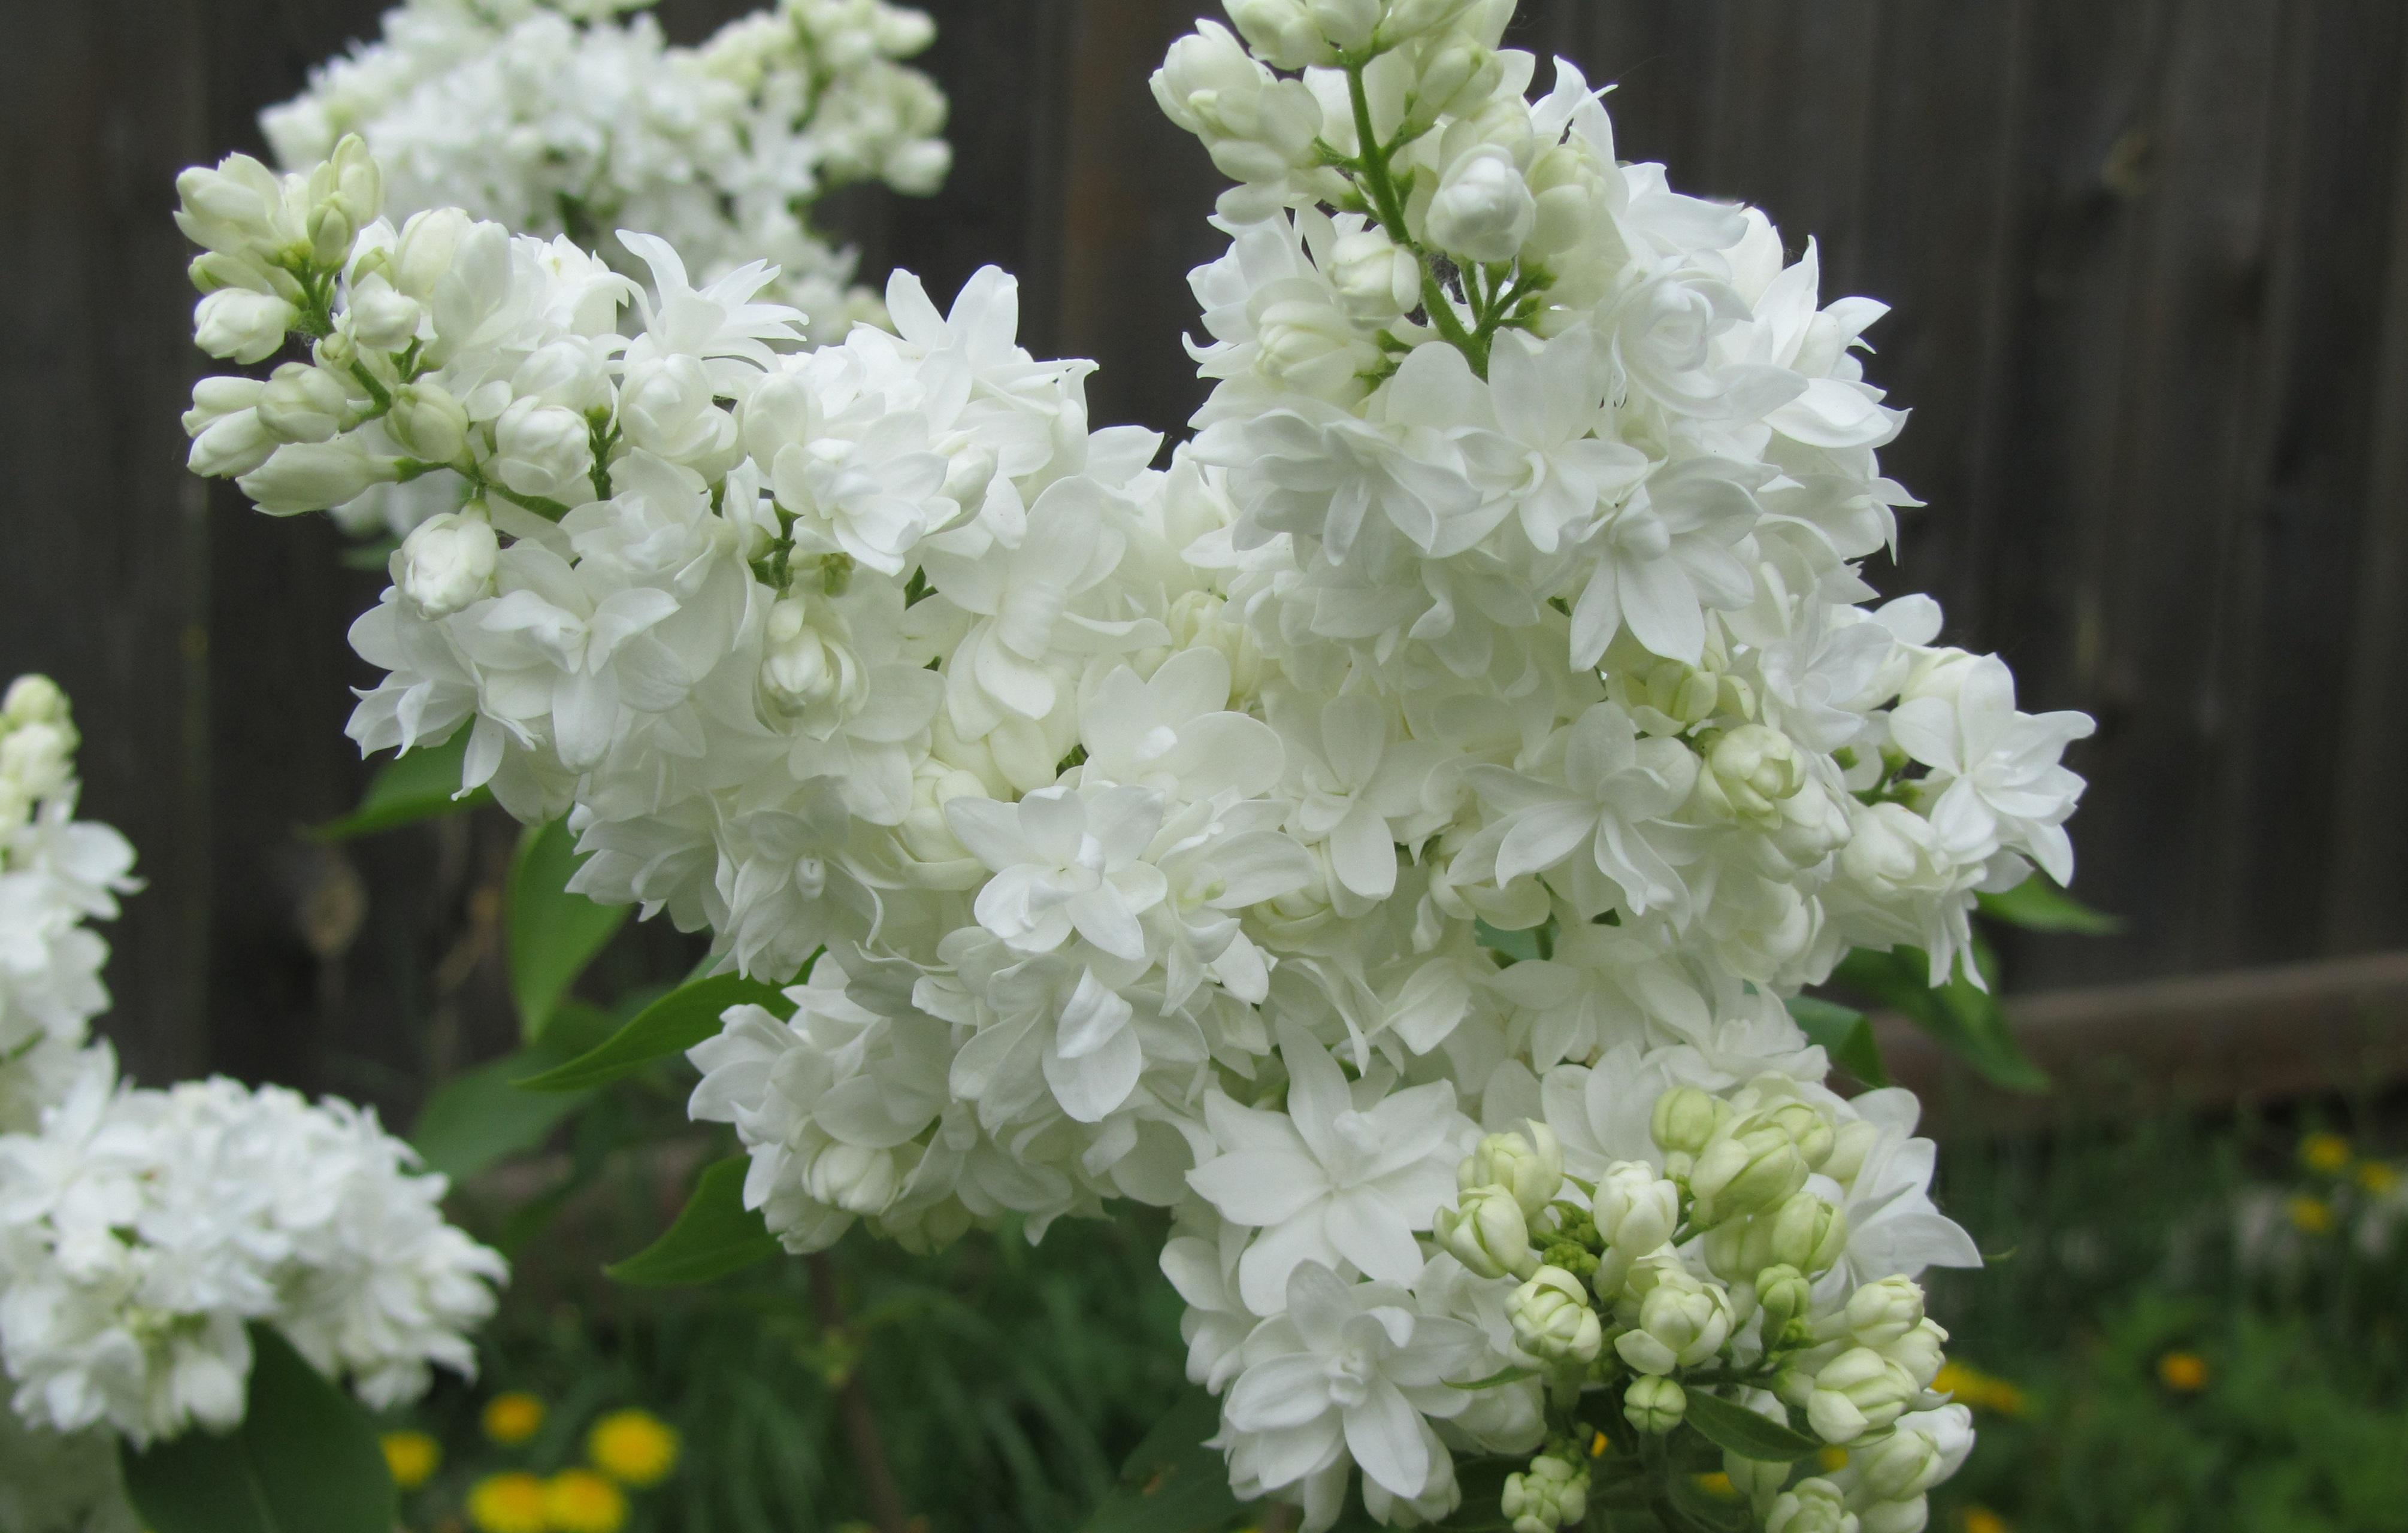 Free Images Blossom White Flower Green Closeup Flowers Shrub